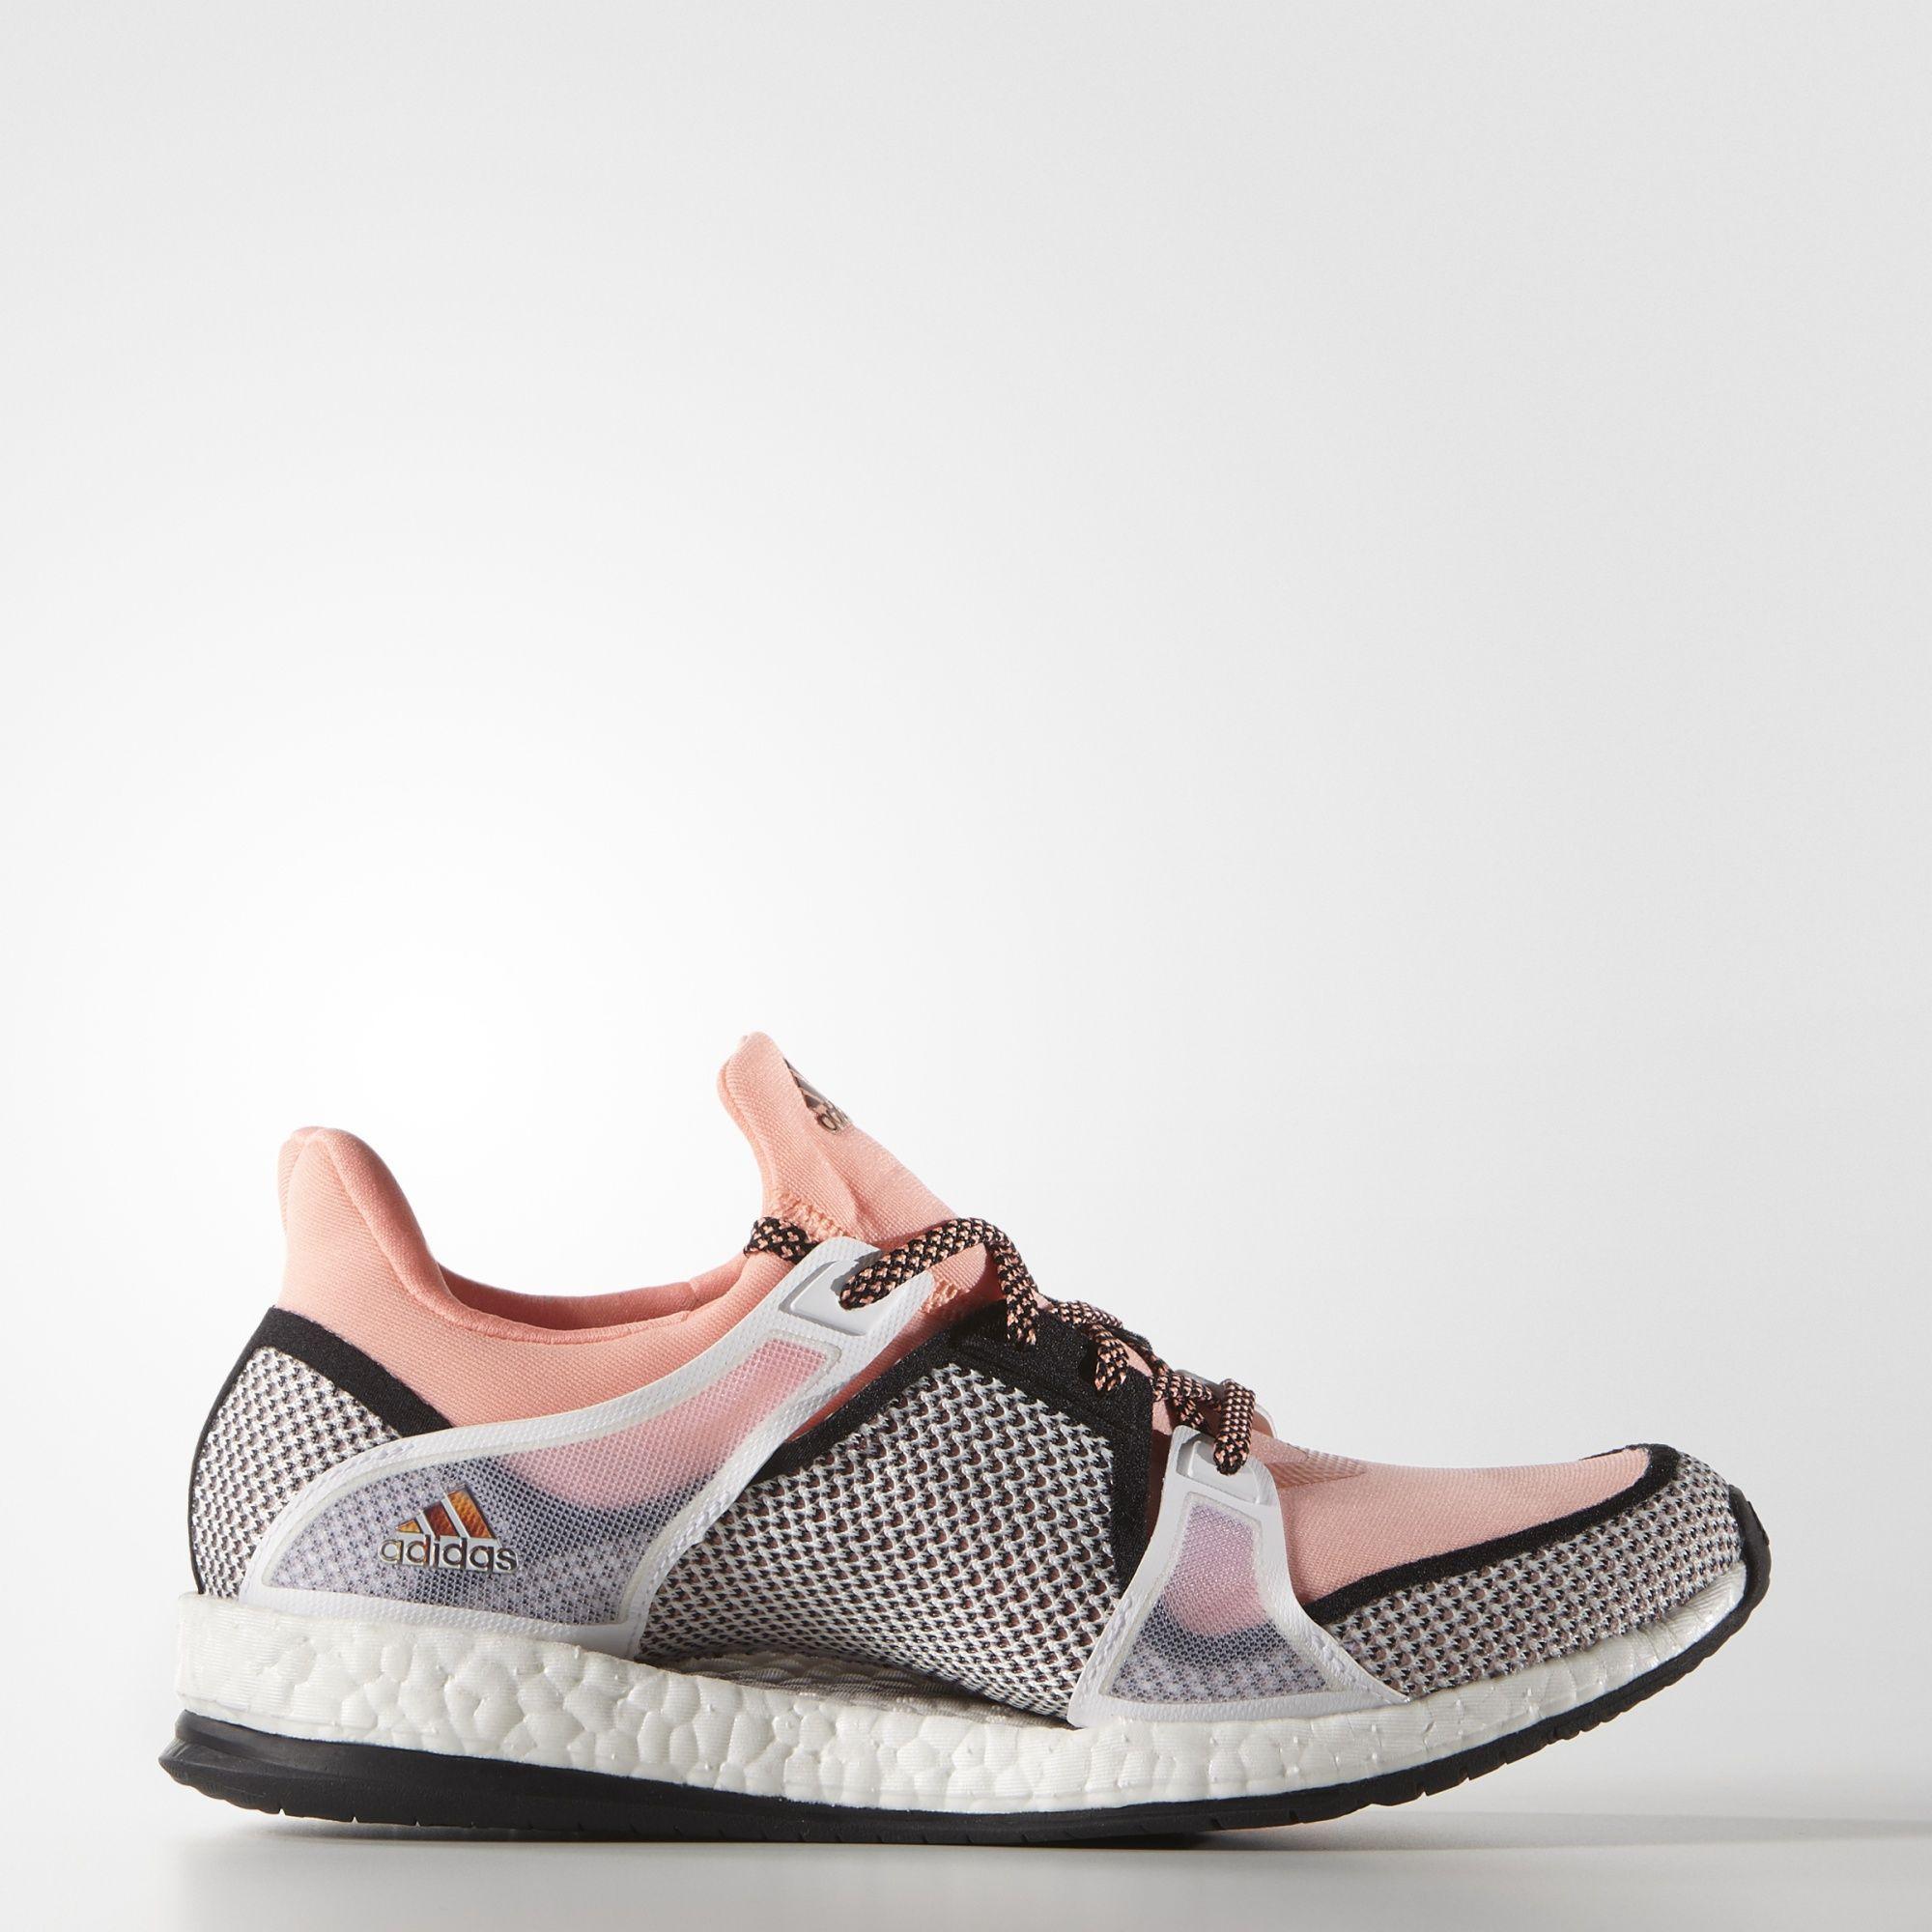 adidas - Zapatilla Pure Boost X Training | Adidas pure boost ...